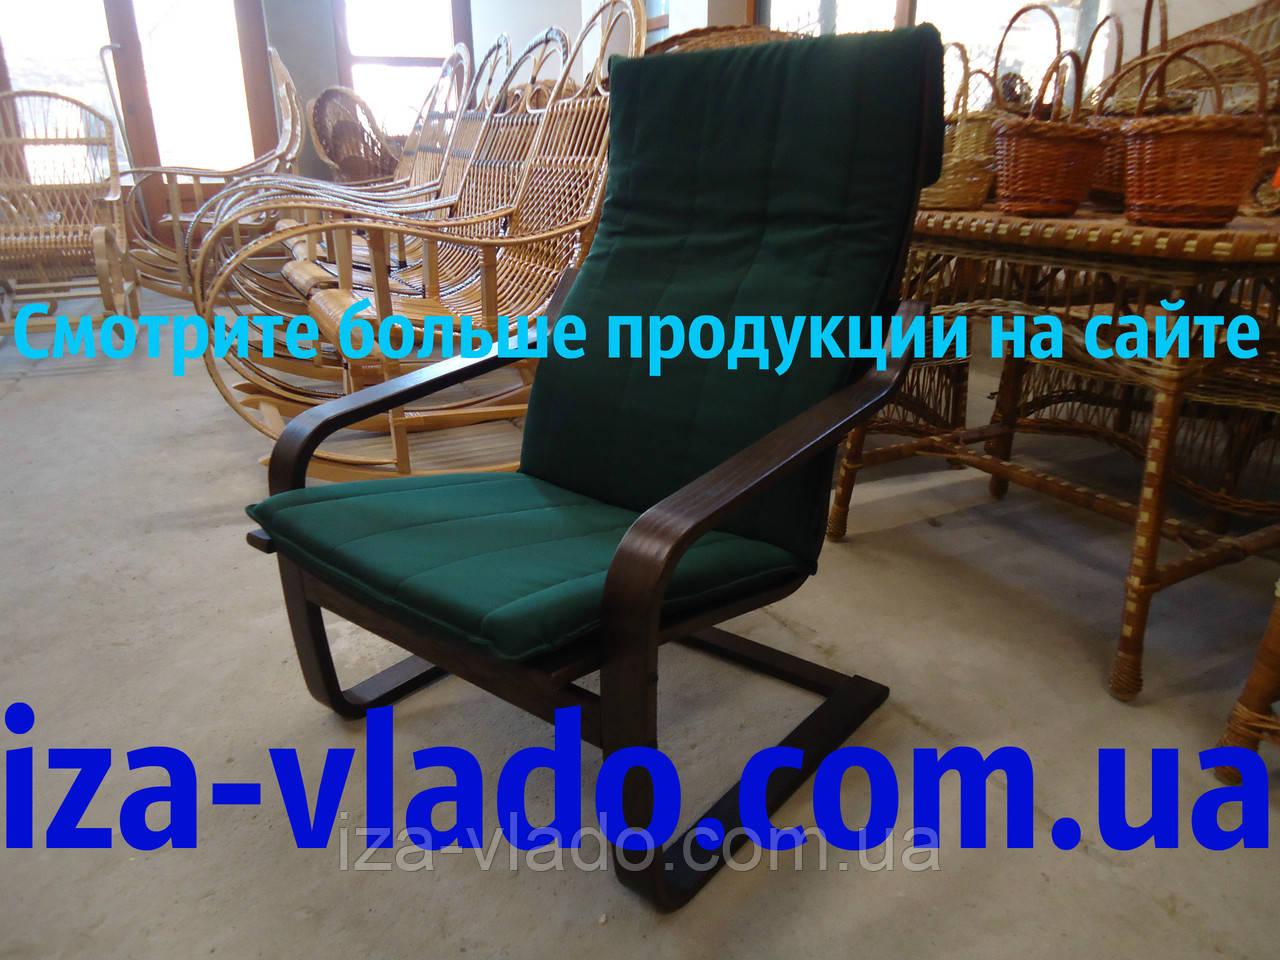 Кресло для отдыха «Лягушка» (пружина) со съемной накидкой